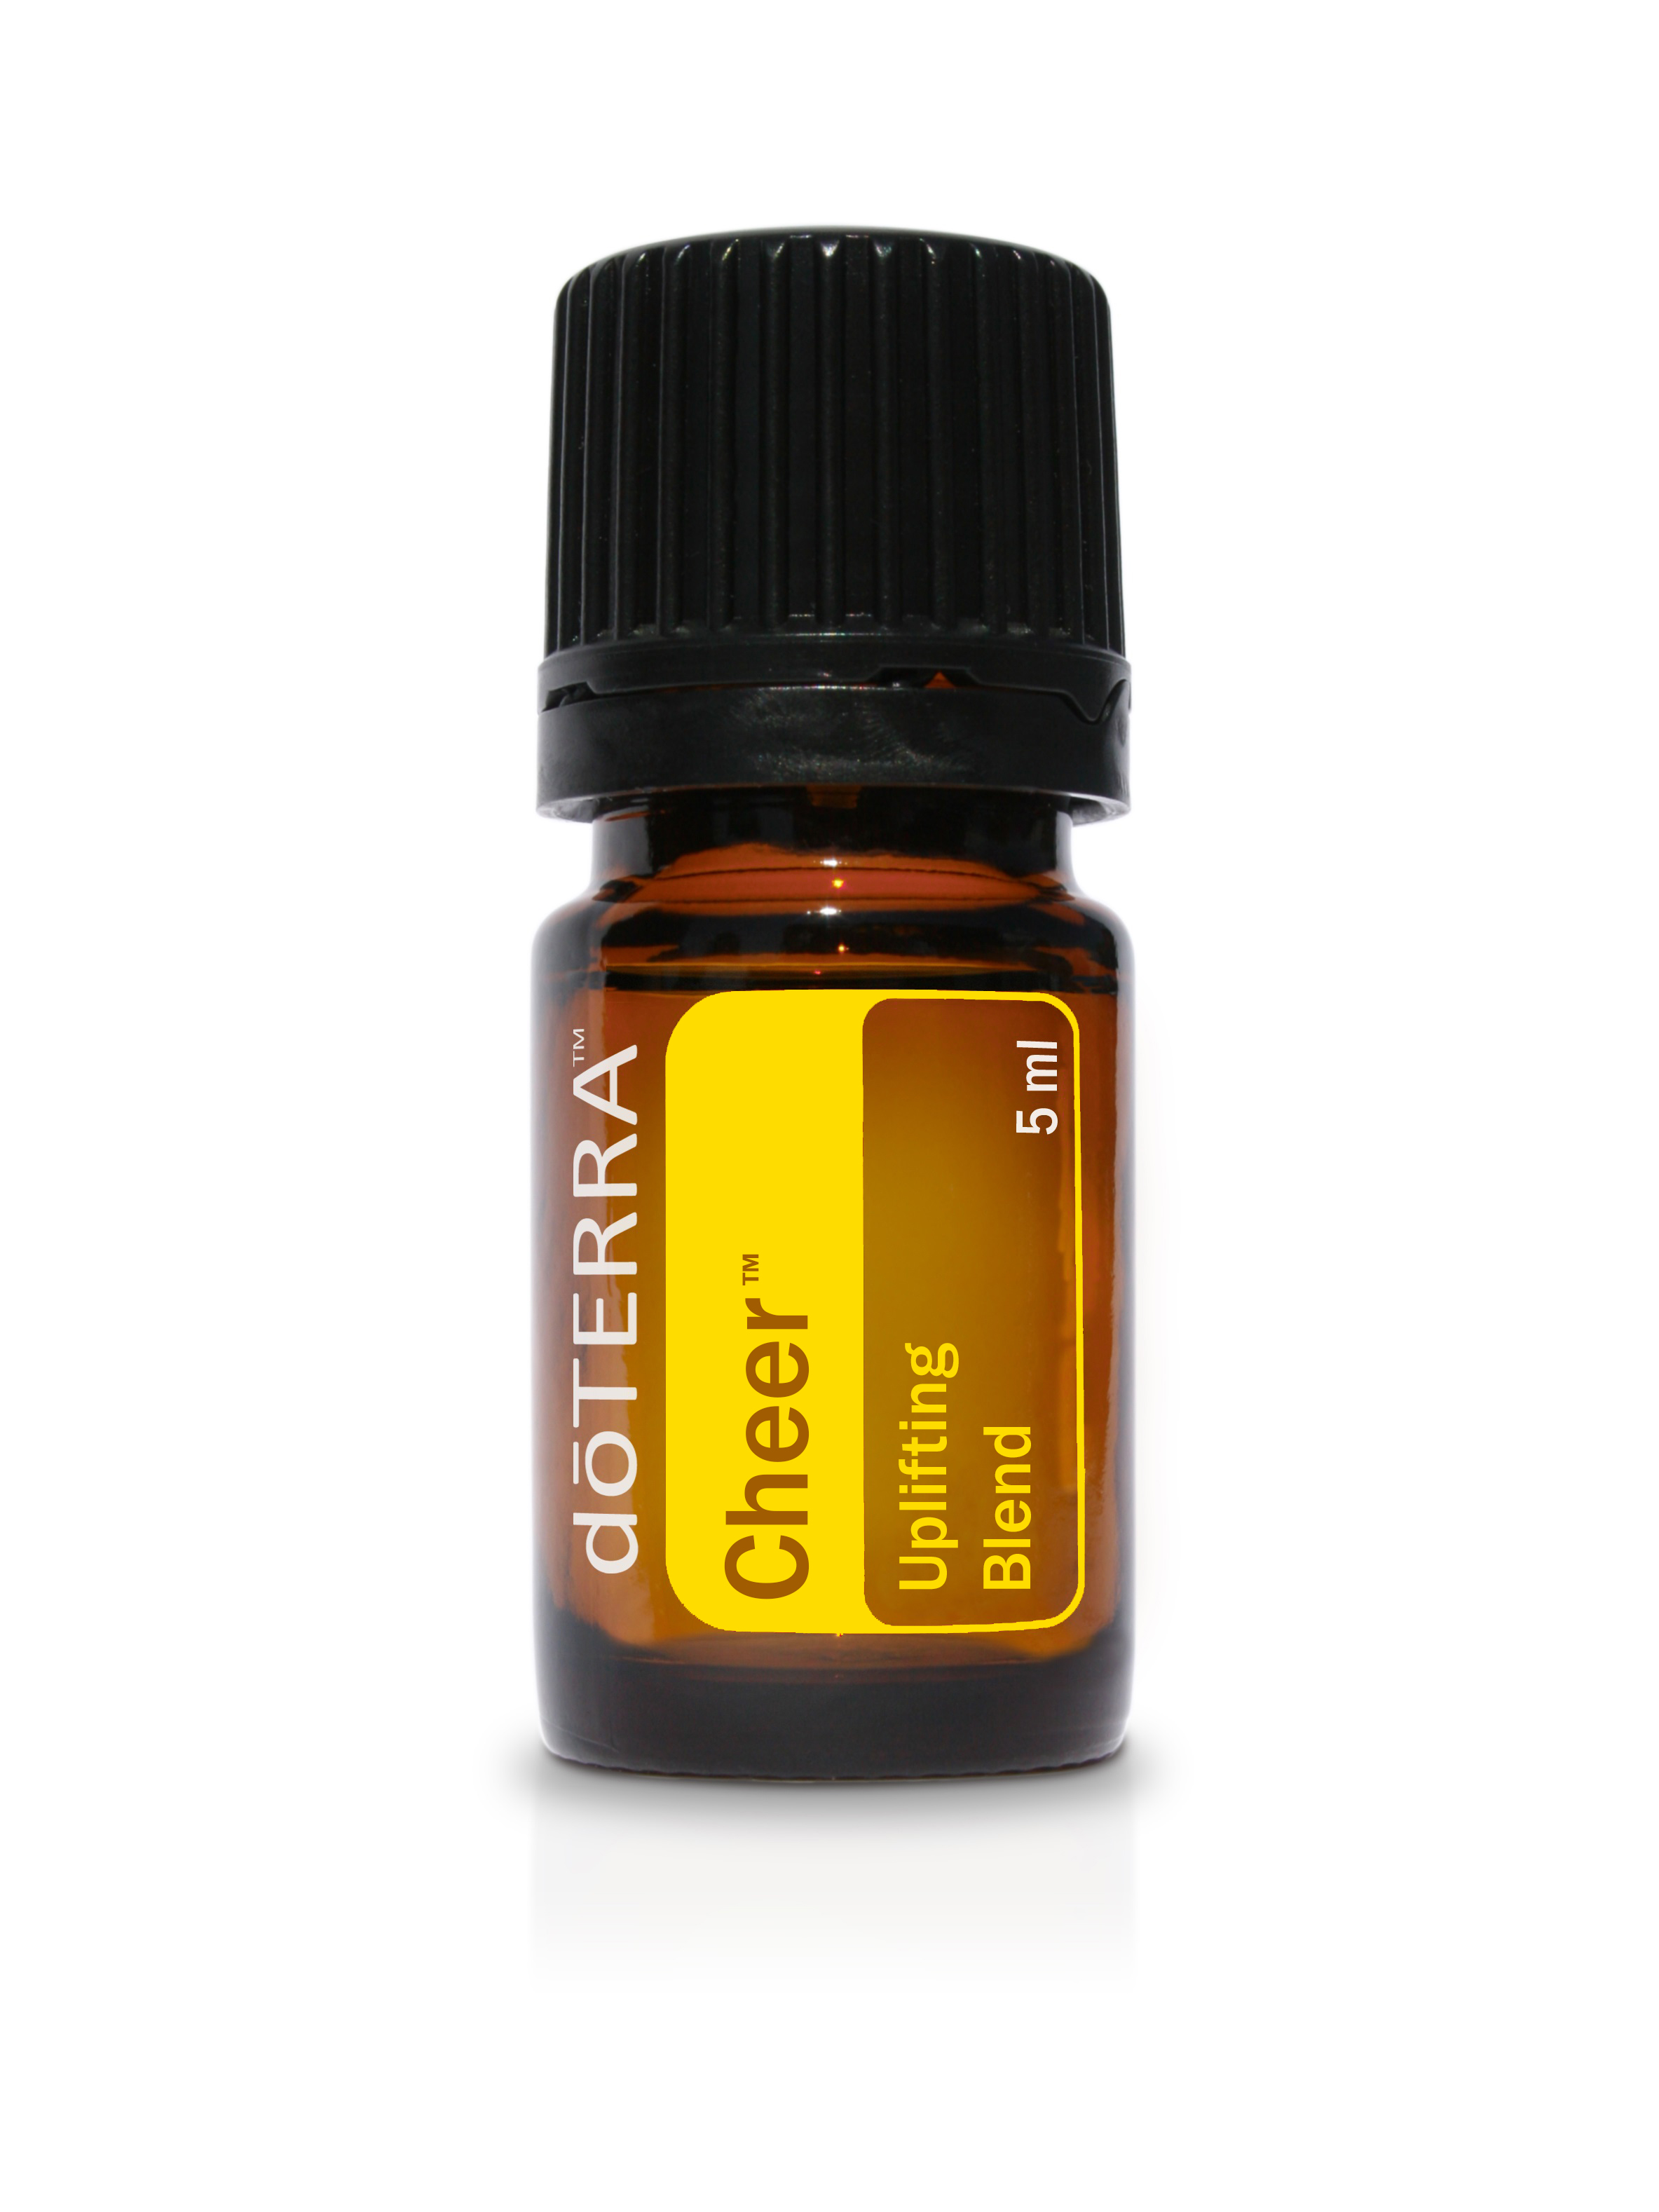 Cheer™ Essential Oil Blend